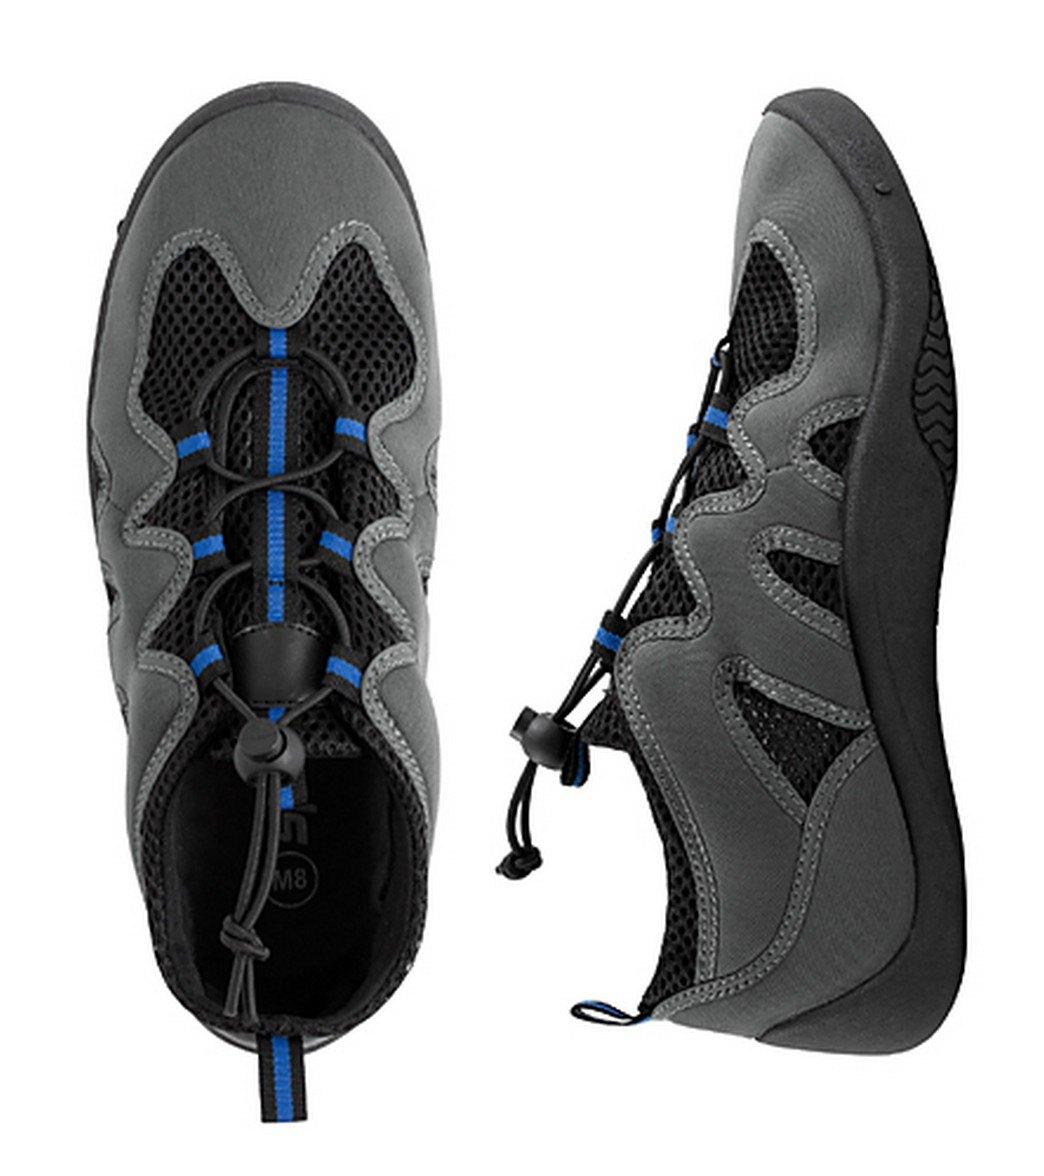 508a6cf3ef48 Sporti Men s TriMesh Water Shoes at SwimOutlet.com